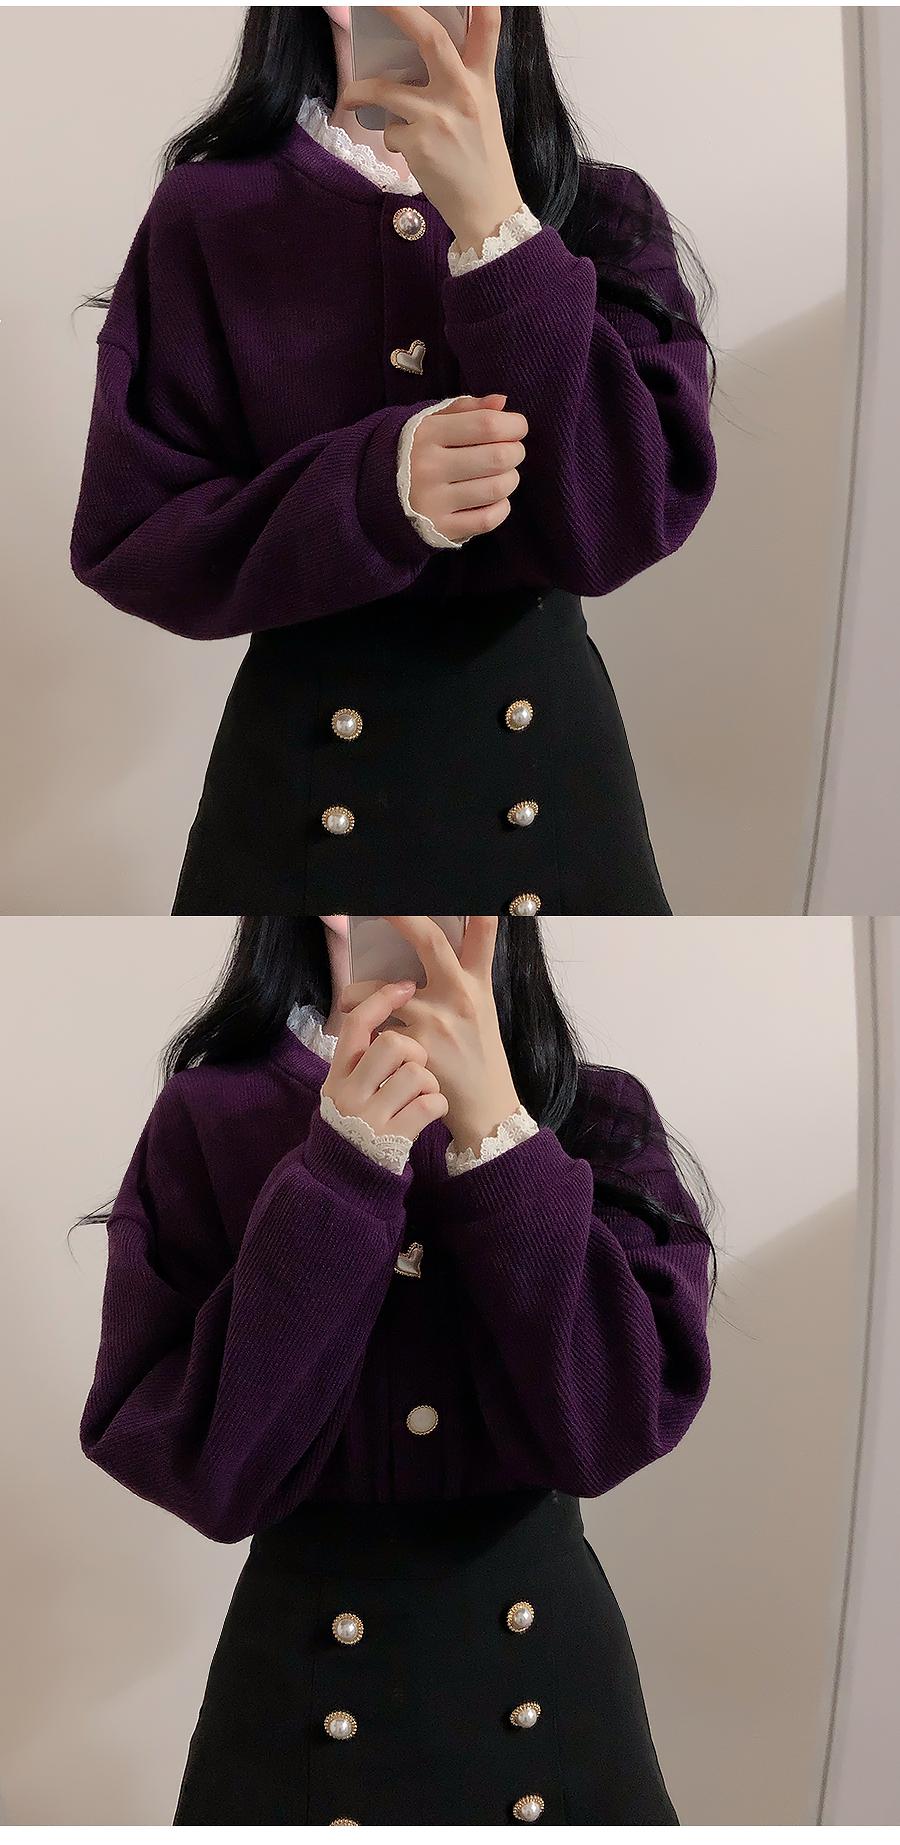 Hand-Made ♥ Life Jewelry Knit Cardigan